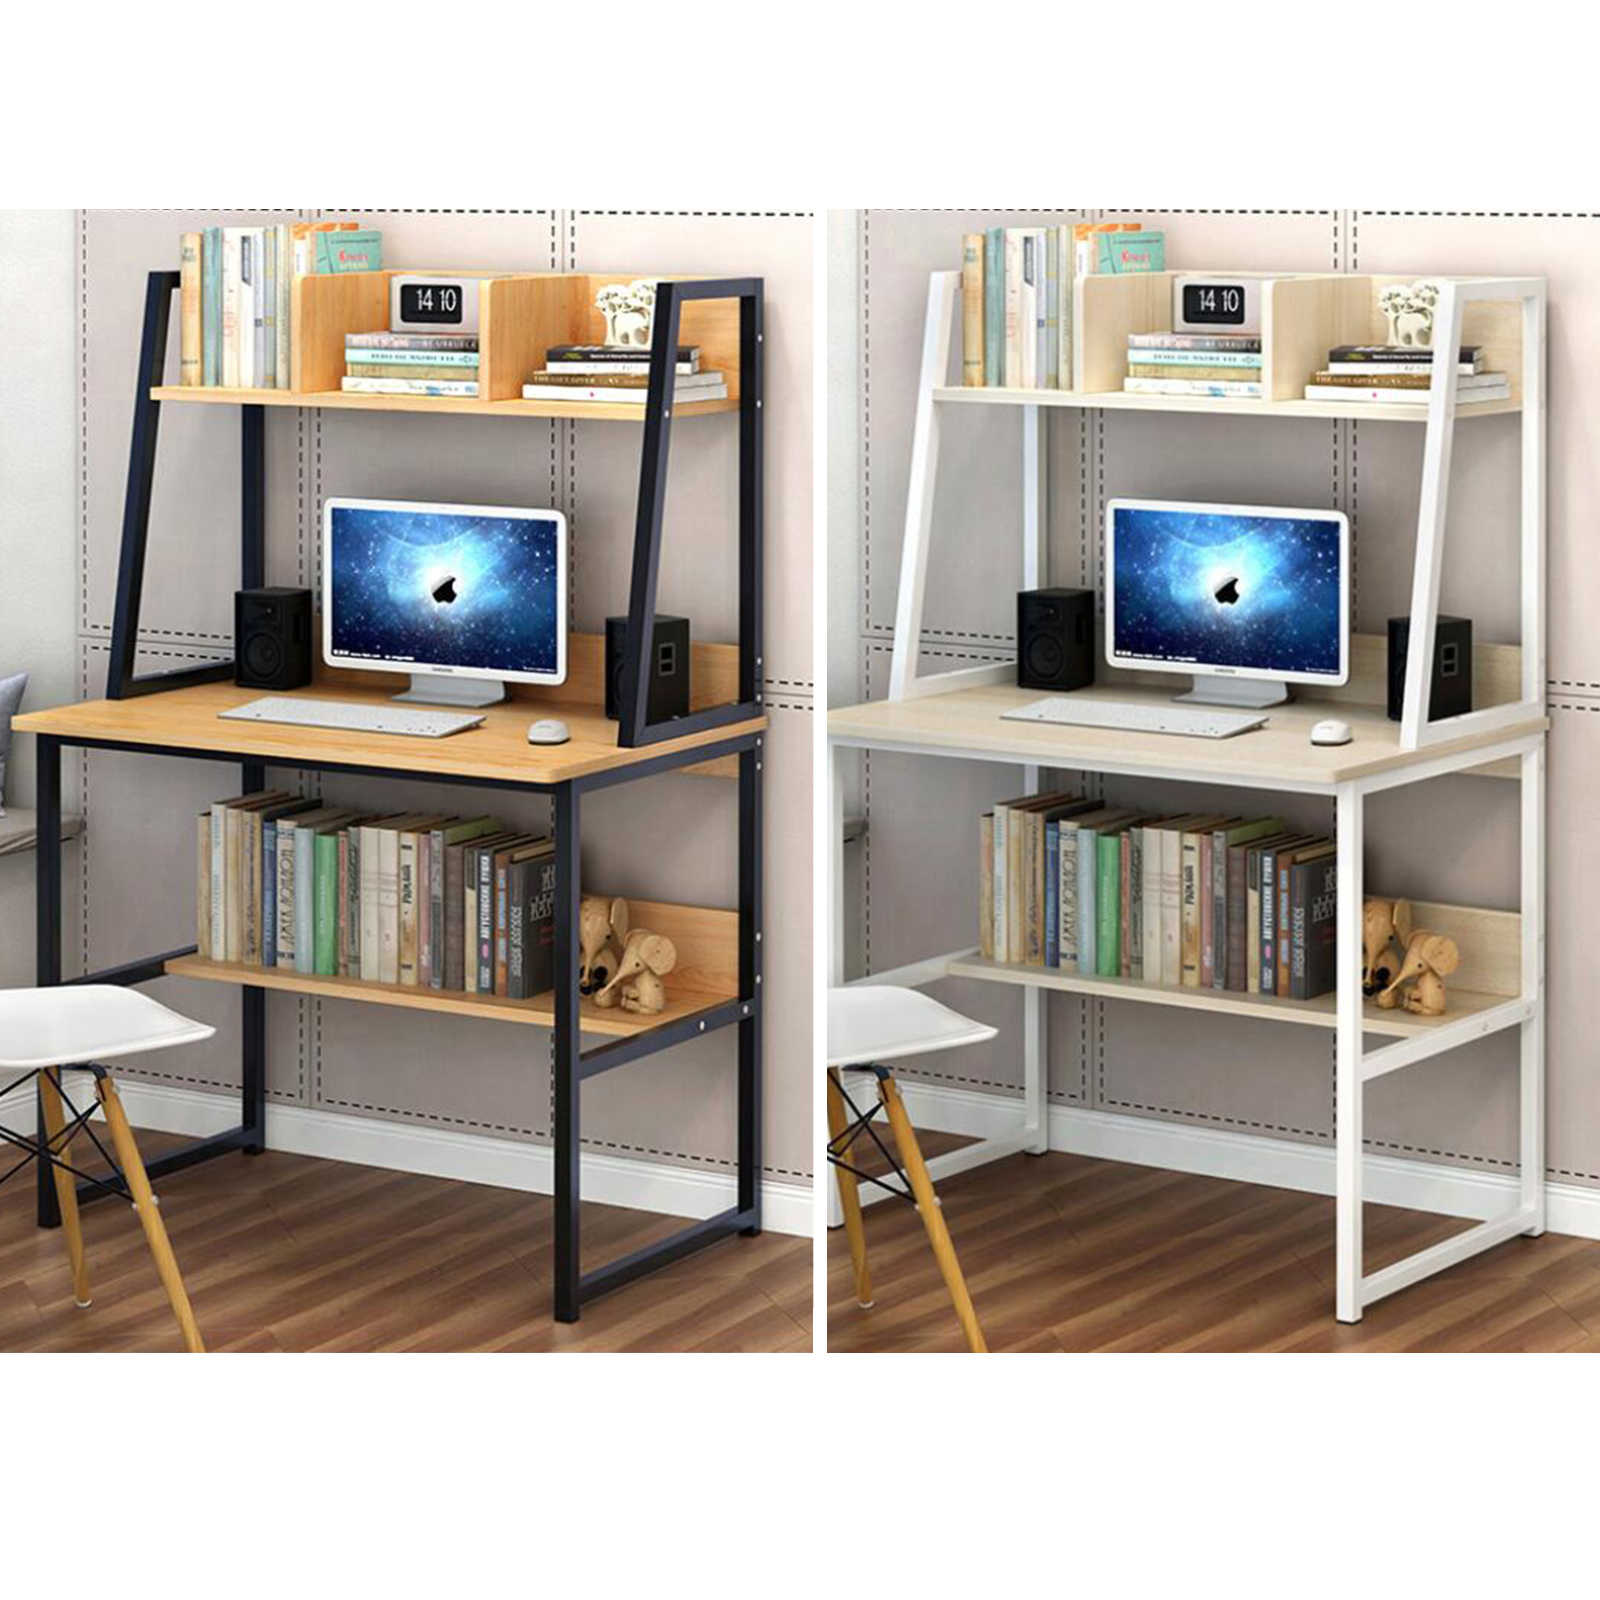 Uk Us Au Warehosue Desk Student Study Office Pc Computer Table Steel Mdf Laptop Furniture Home White Yellow Laptop Desks Aliexpress